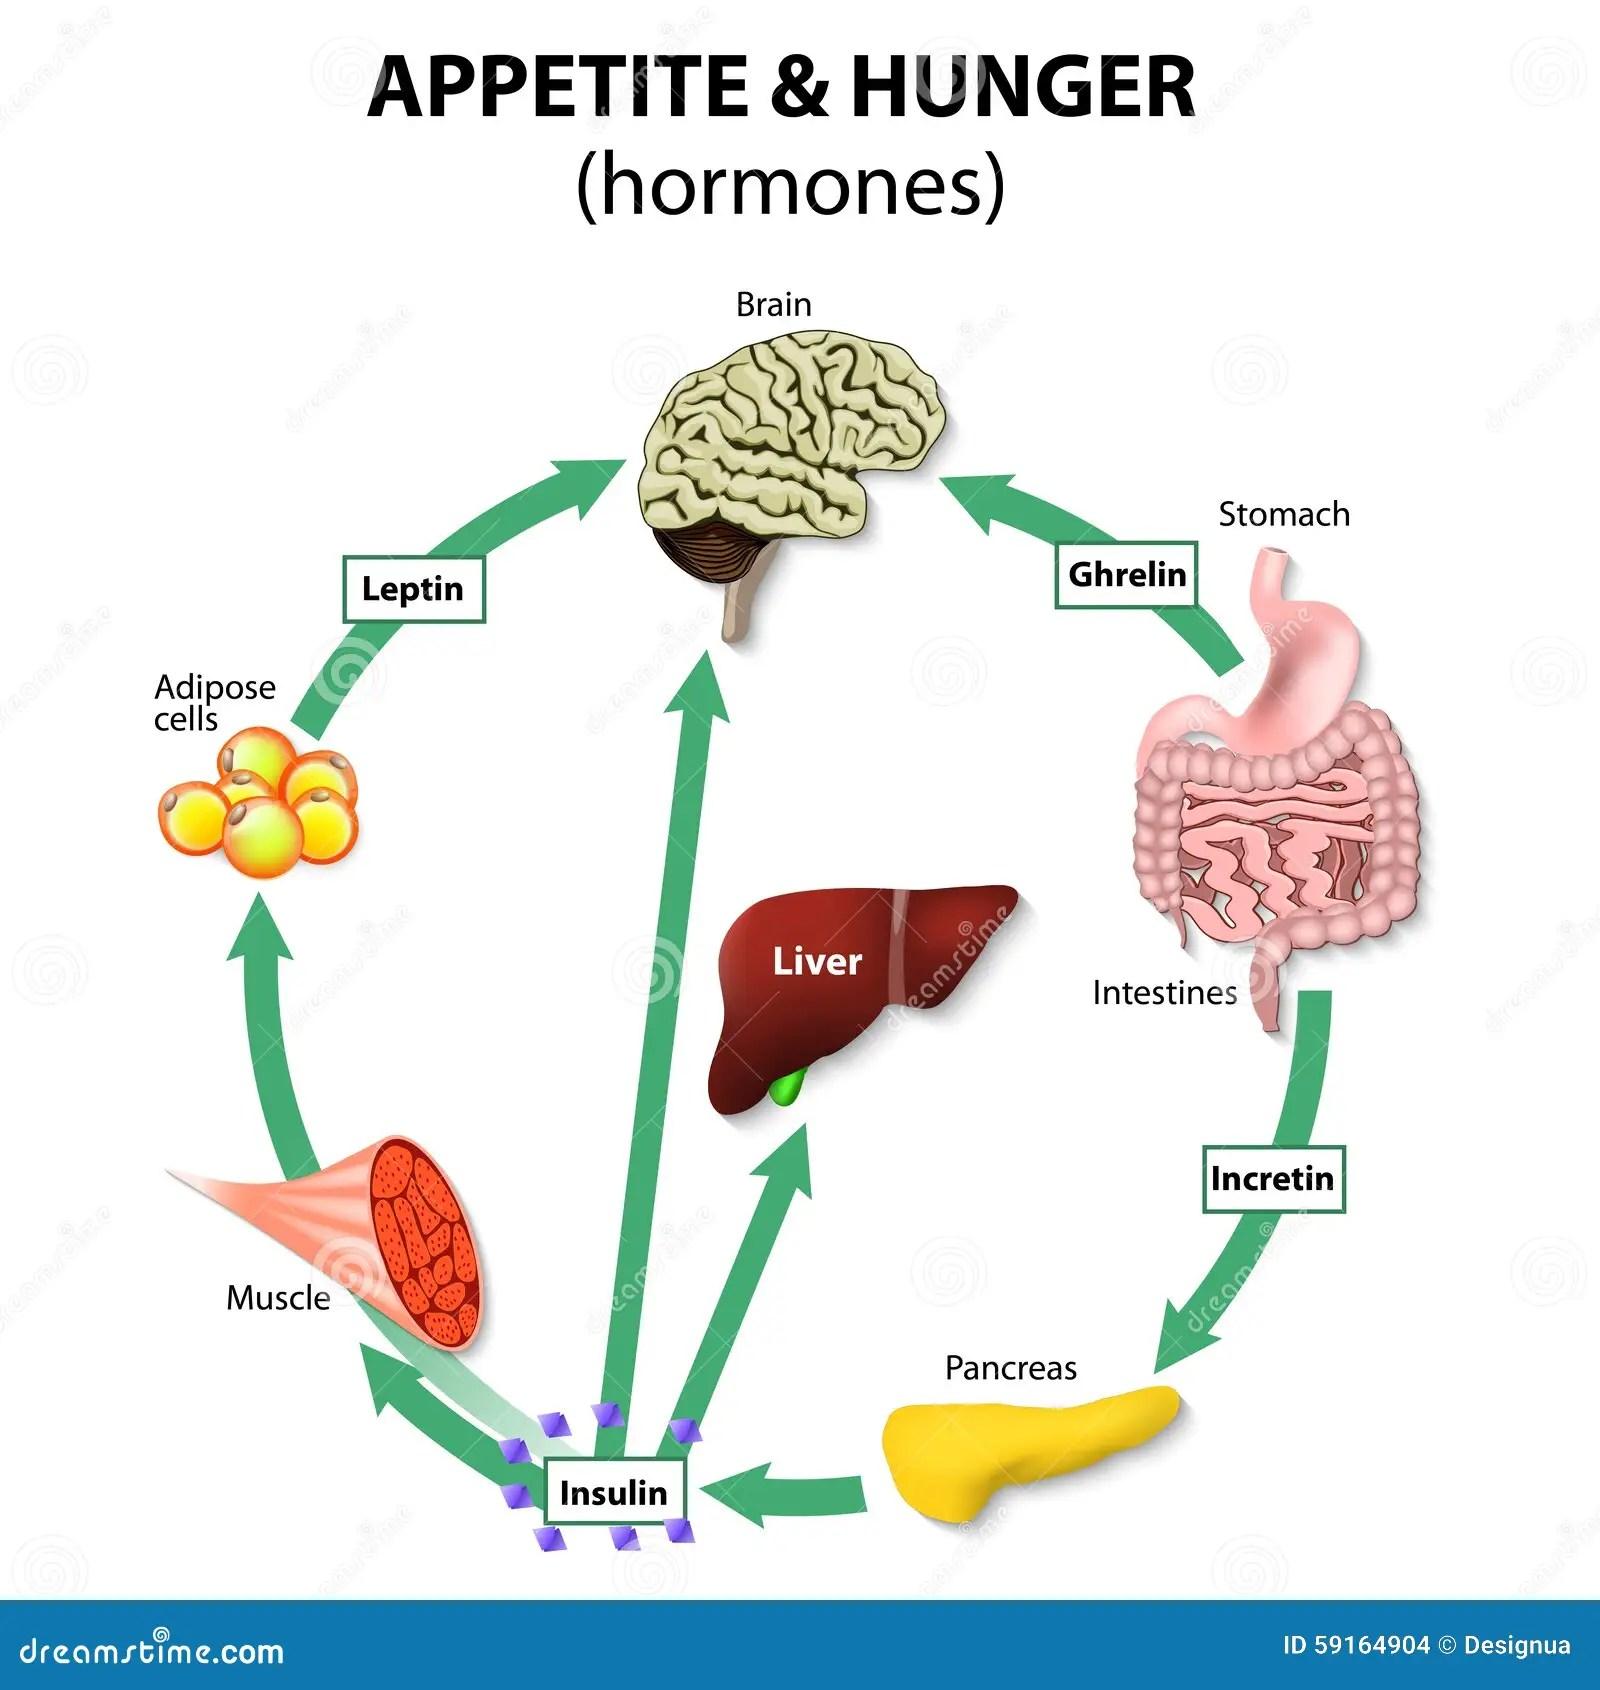 Hormones Appetite Amp Hunger Stock Photo